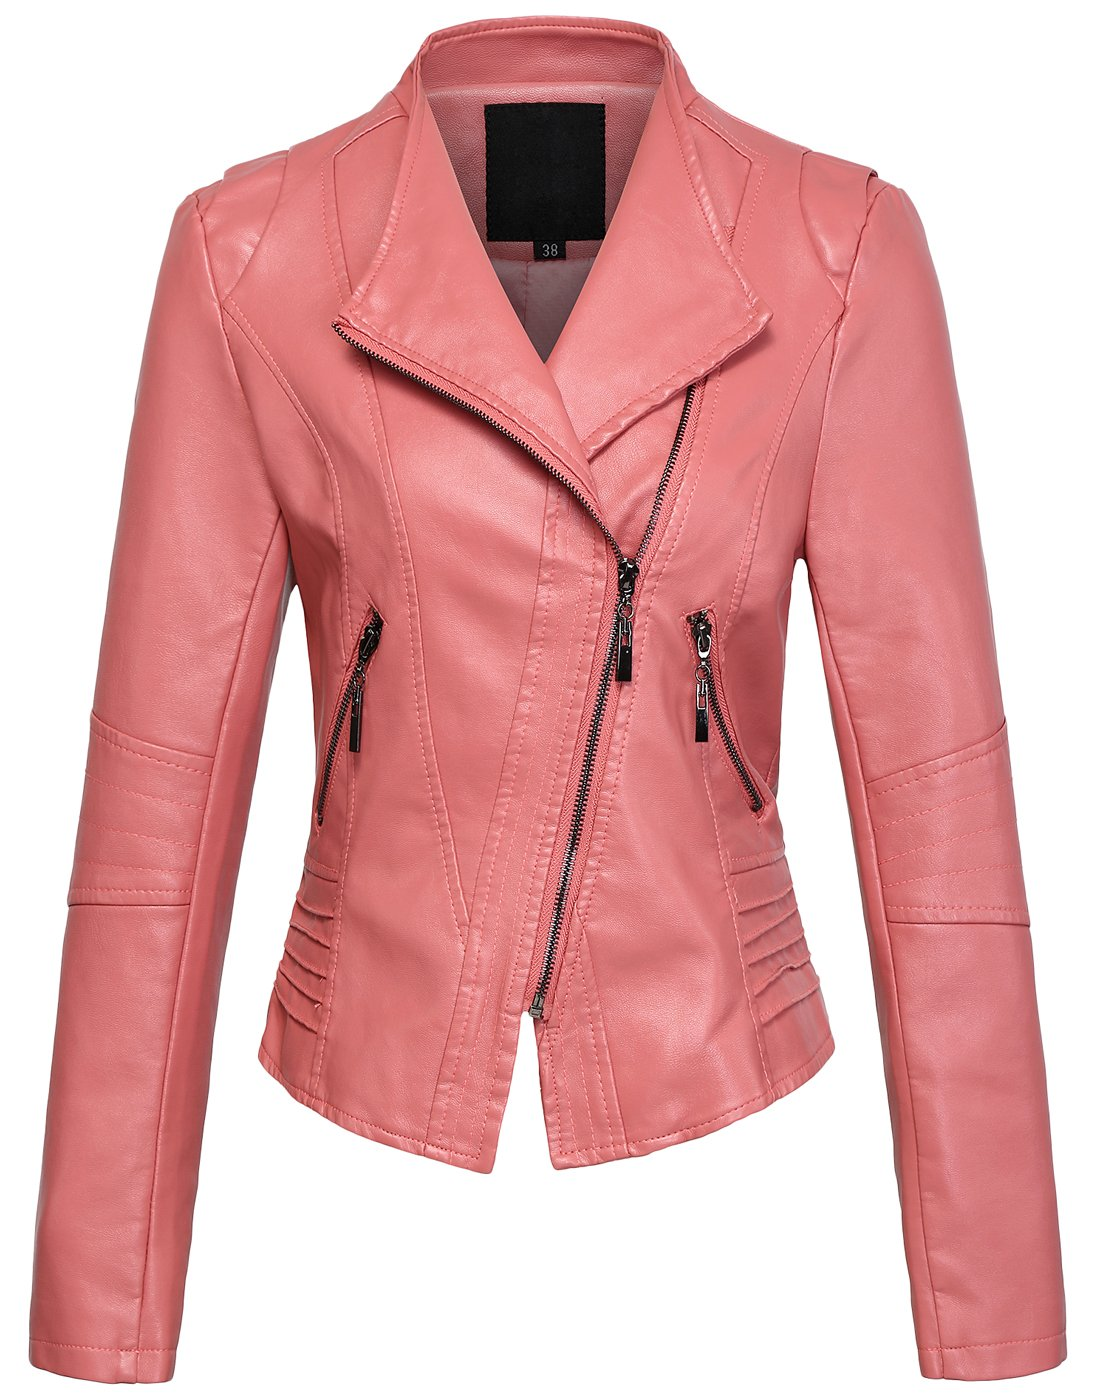 Chouyatou Women's Casual Collarless Perfect Fit Cropped Pu Leather Biker Jacket (X-Small, Pink)